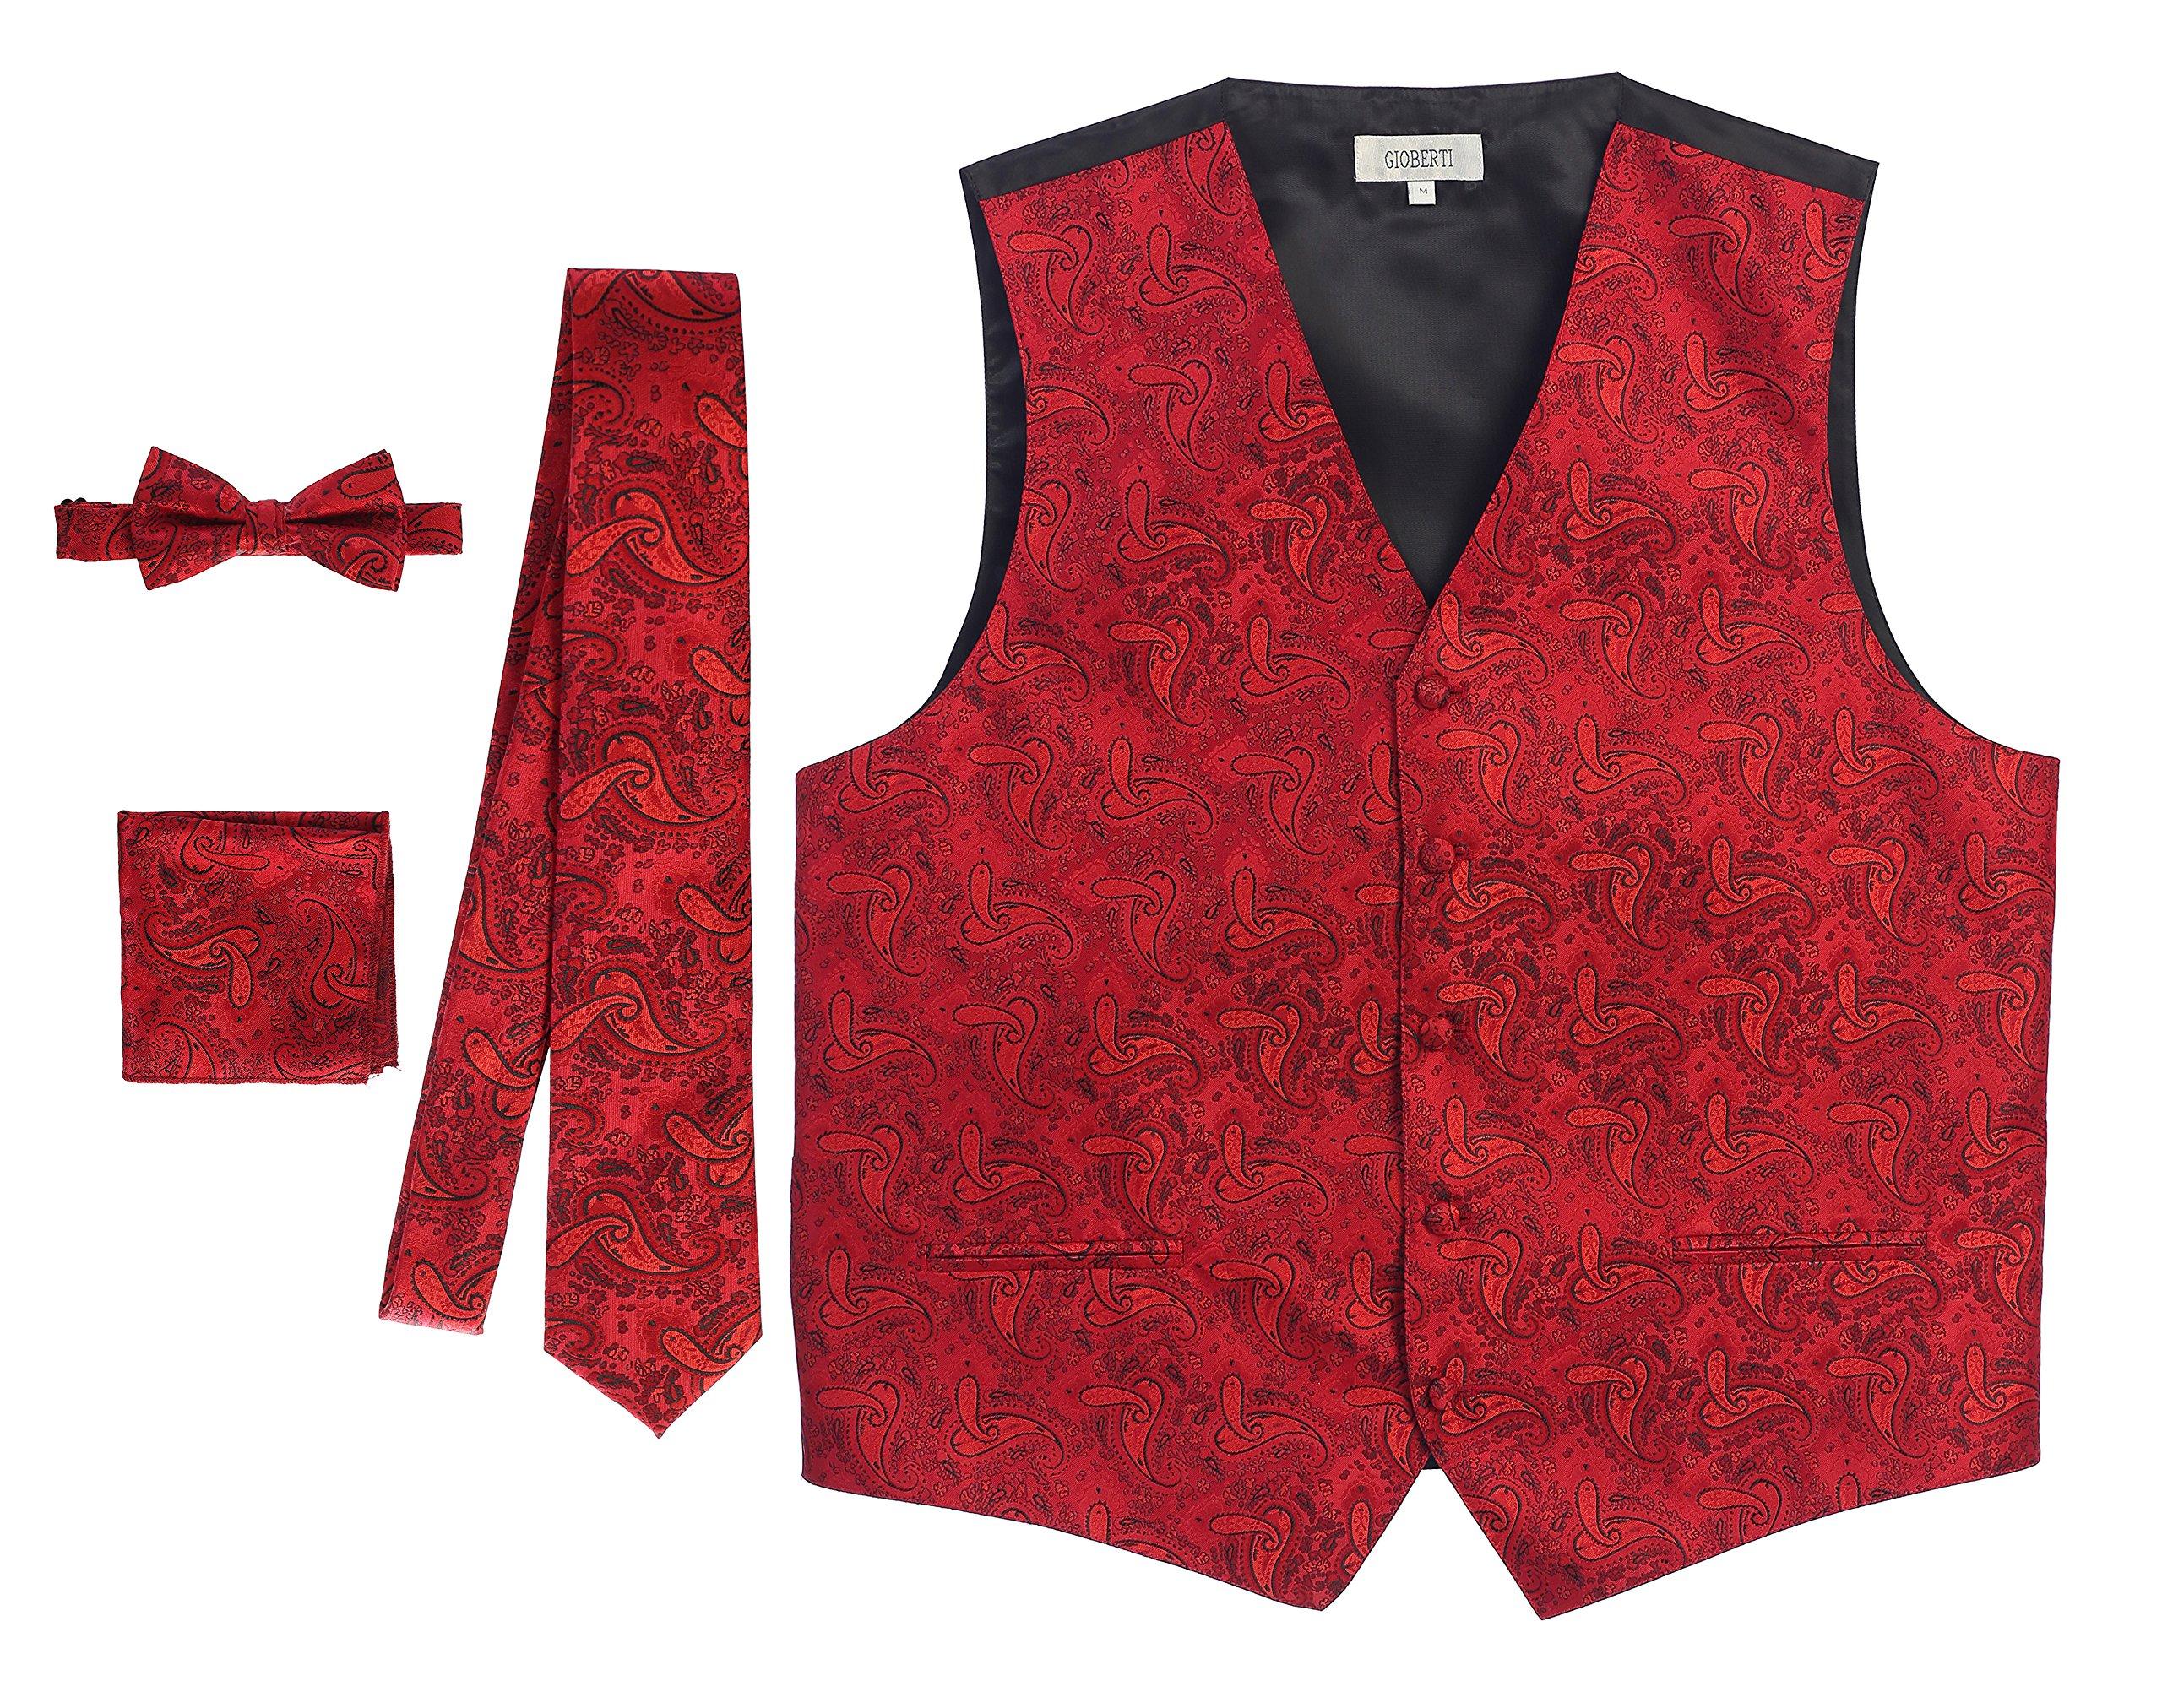 Gioberti Men's 4 Piece Formal Paisley Vest Set, Red, 3X Large